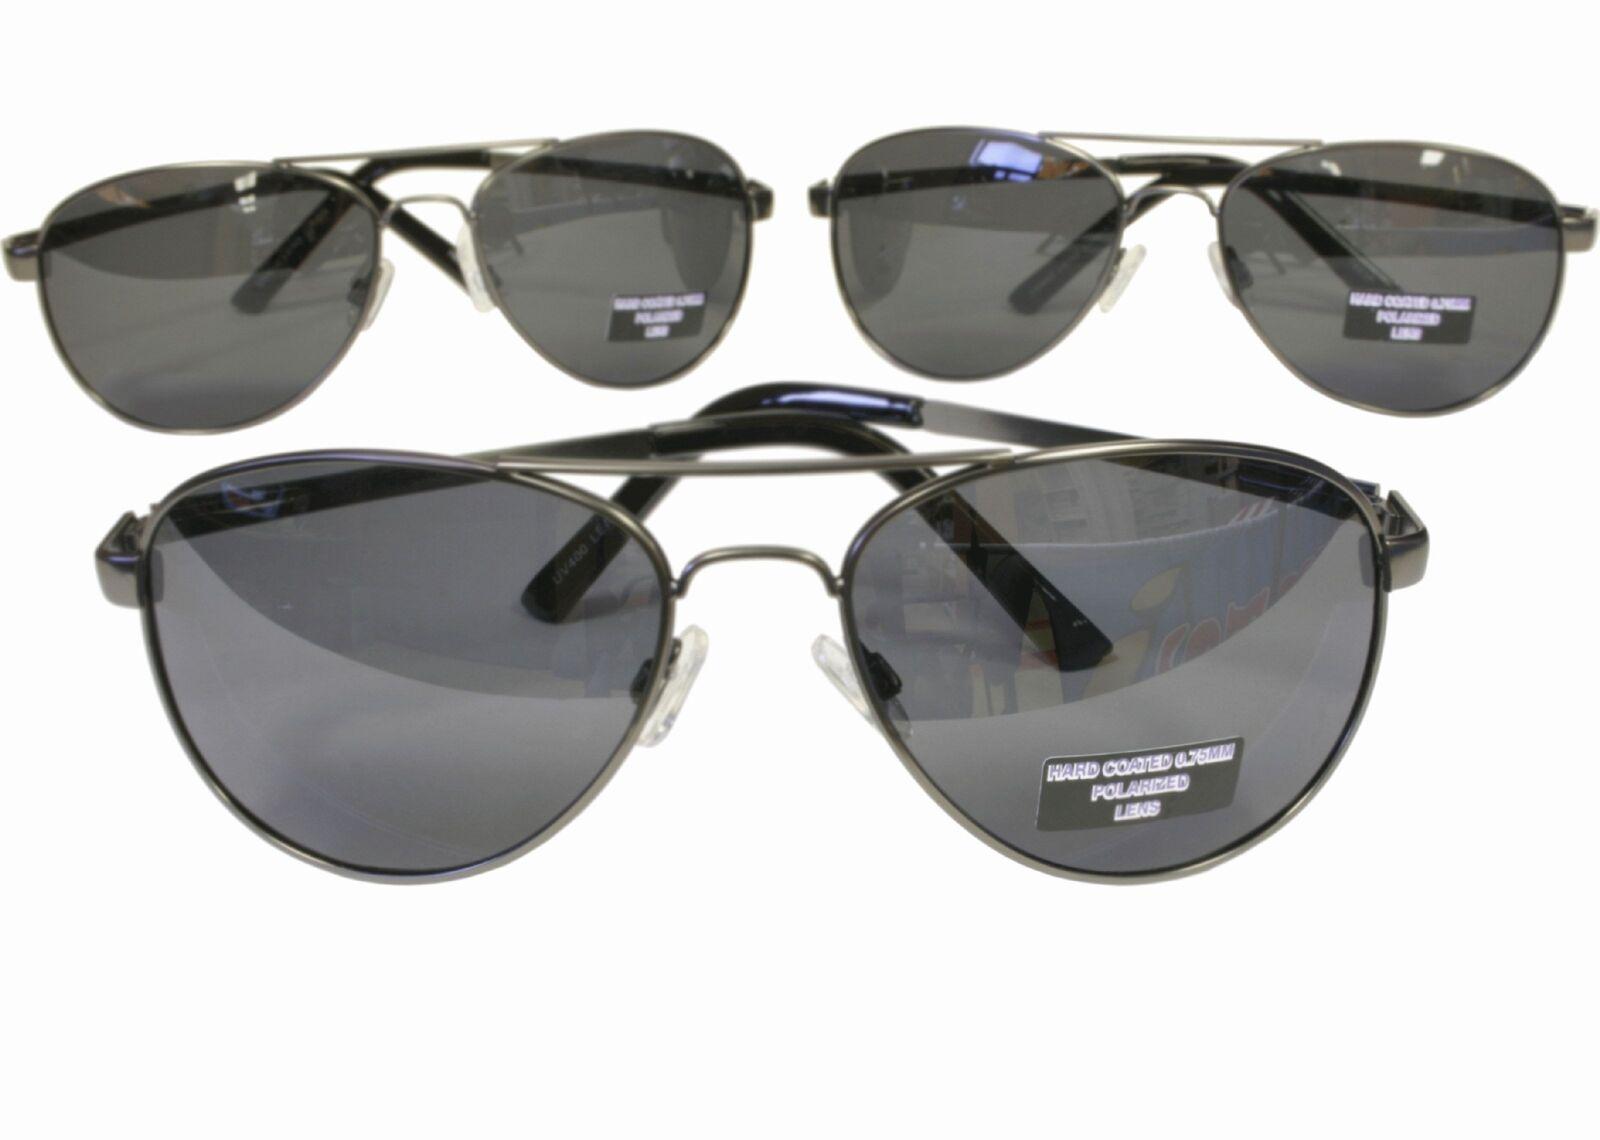 G&G 3pk 48mm Polarized Aviator Sunglasses Black Gray